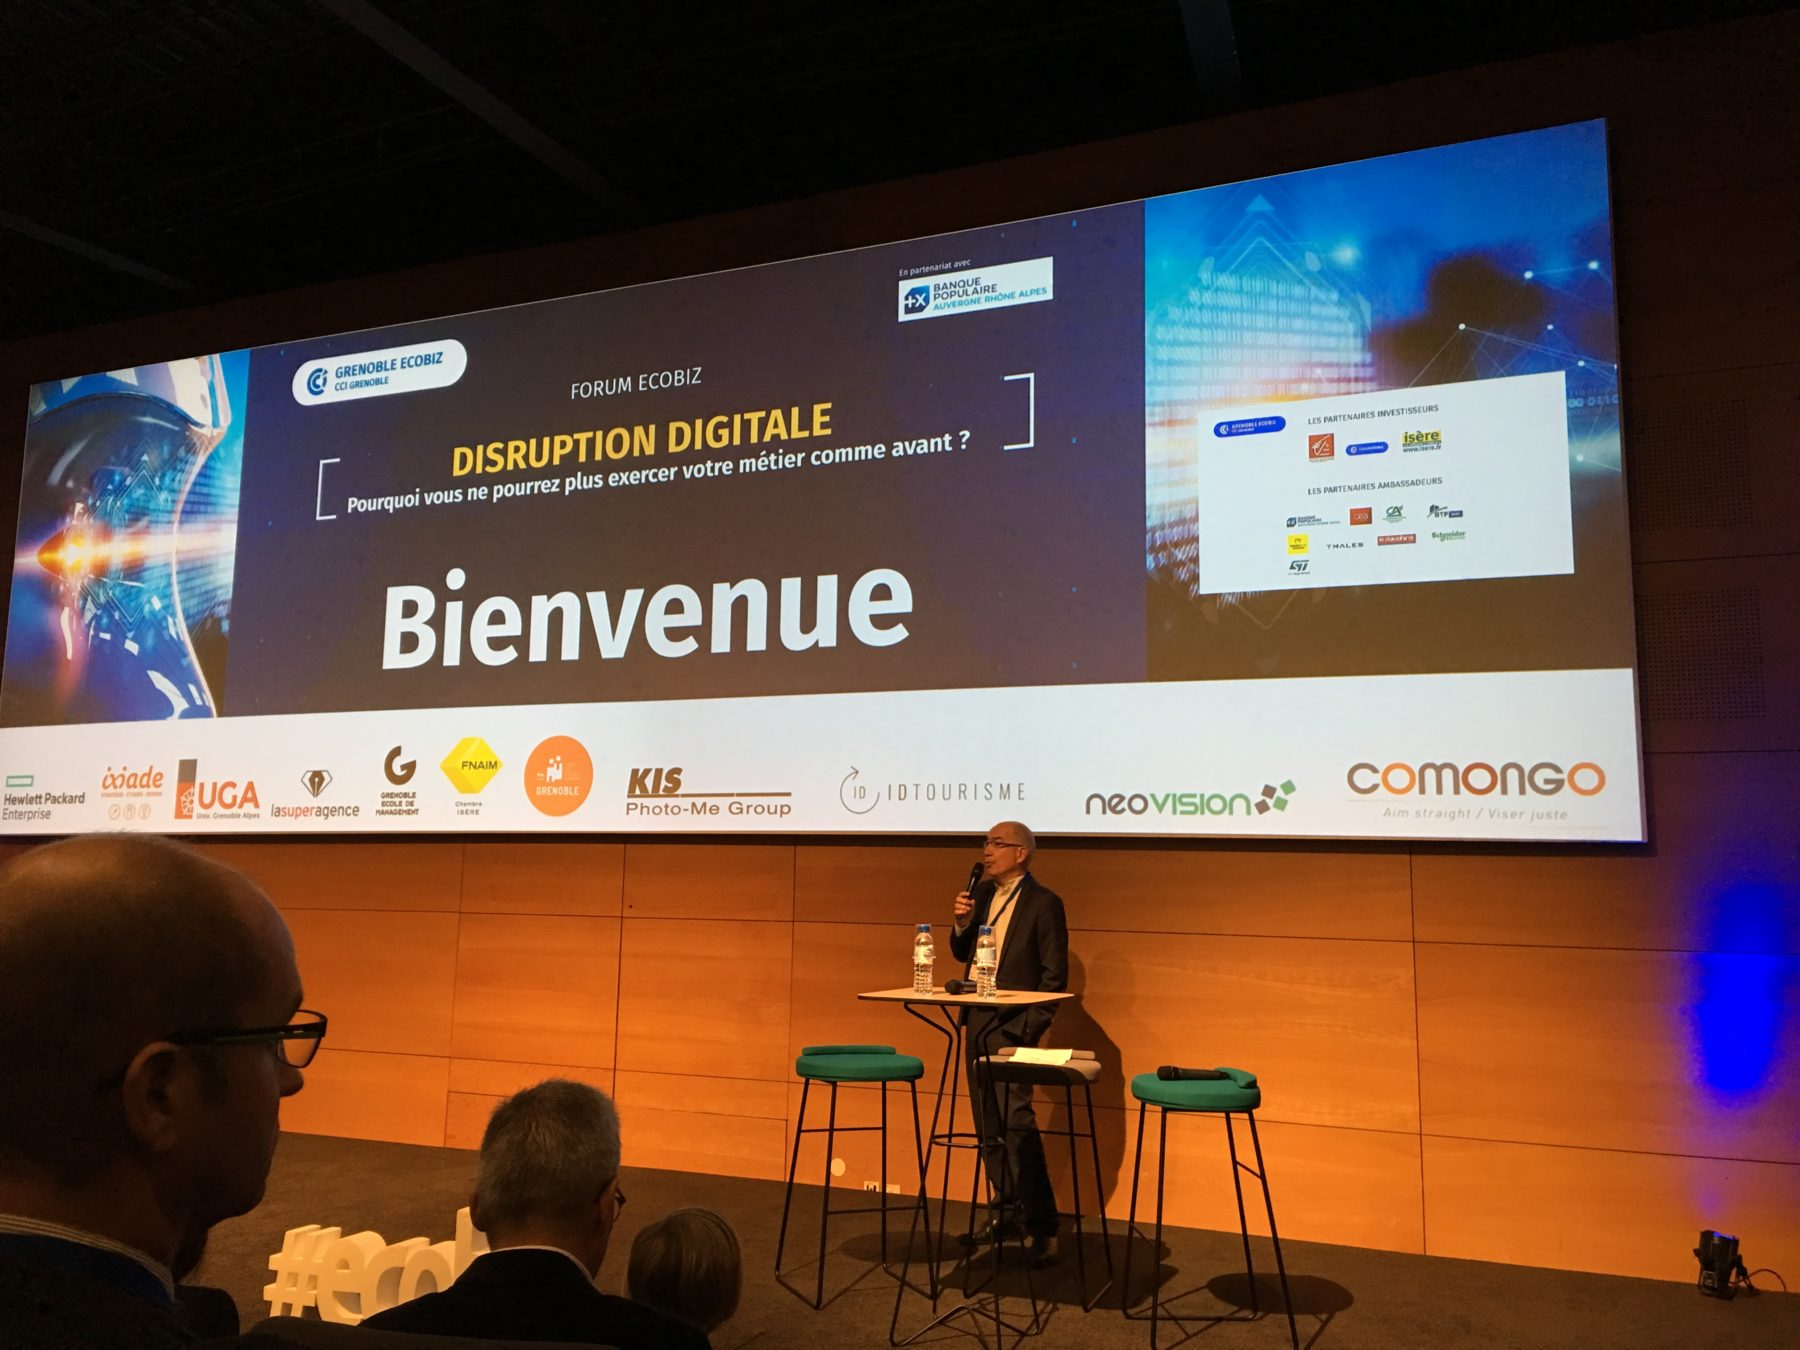 Forum Ecobiz – 8 Octobre 2019